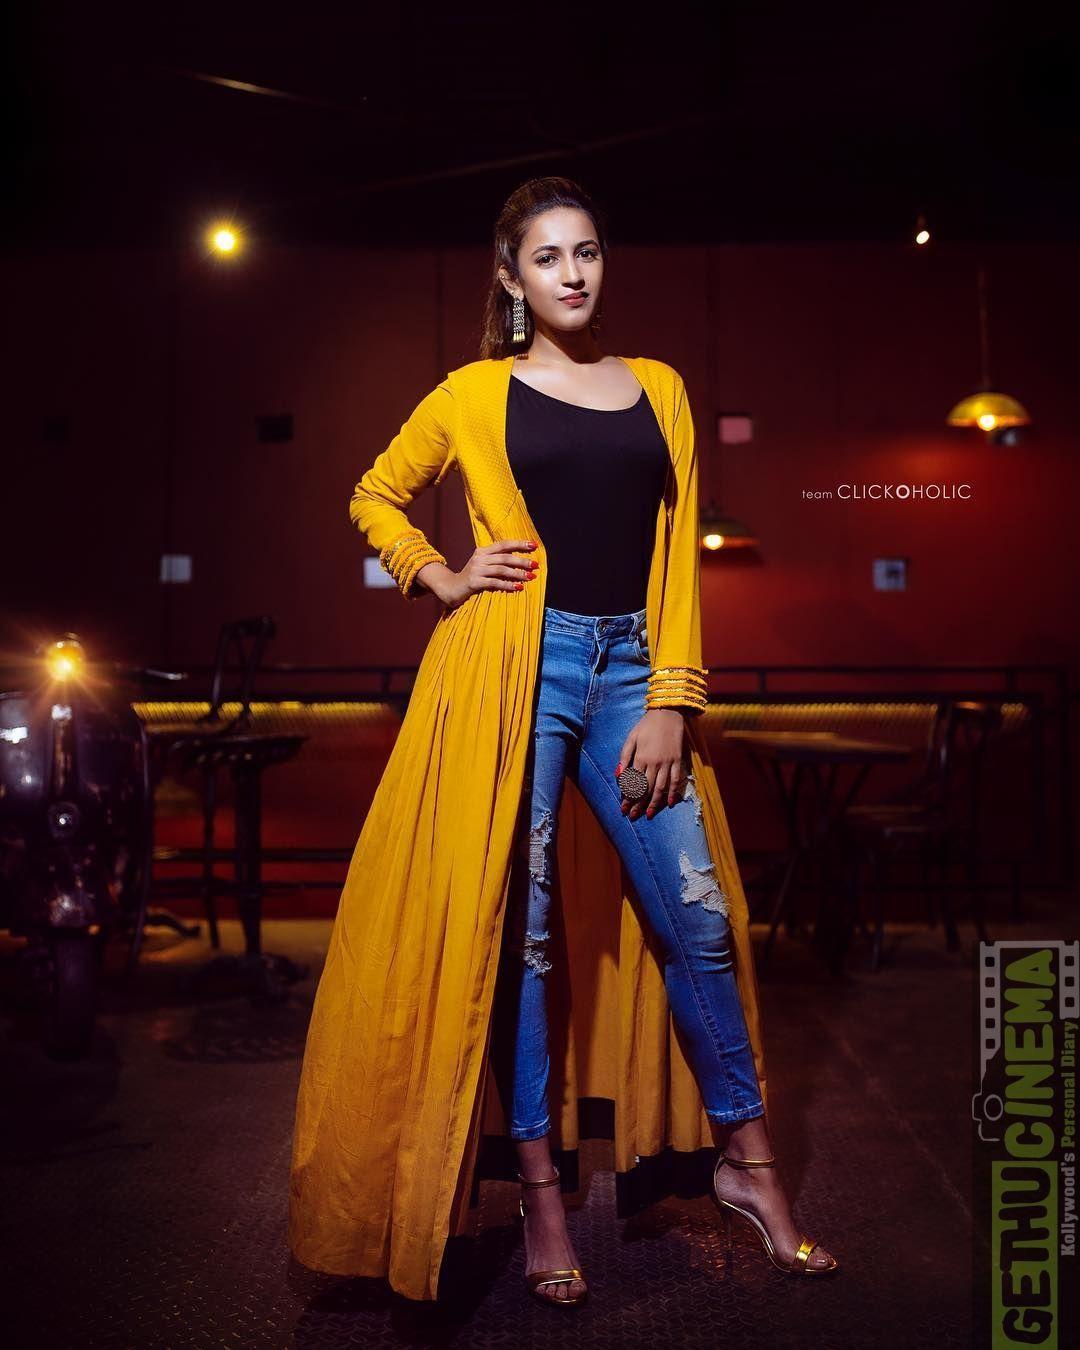 Actress Niharika Konidela 2018 New HD Images Actresses